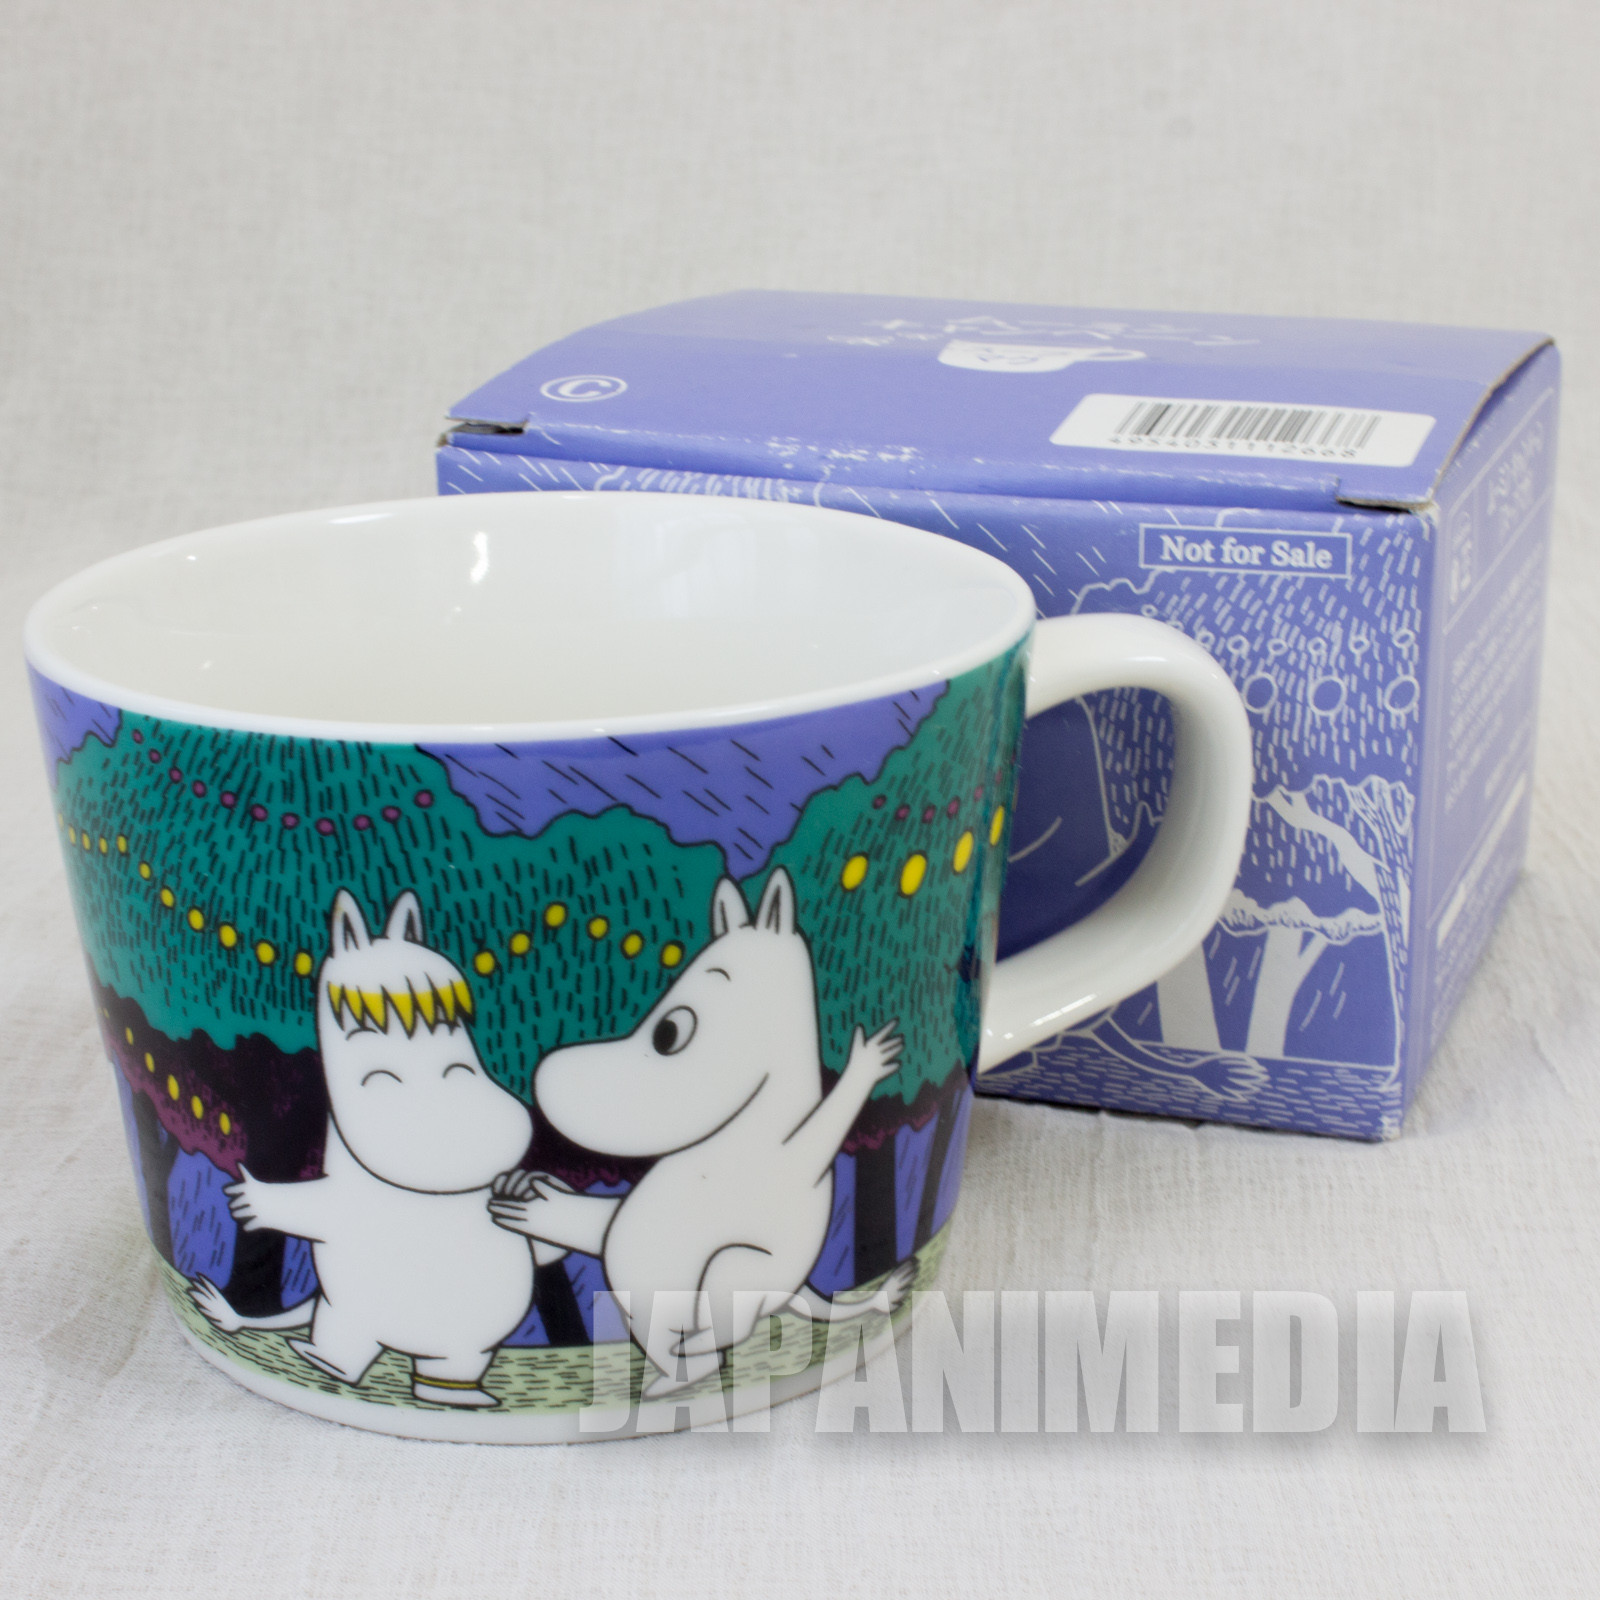 Moomin Soup Mug KFC Japan - Japanimedia Store